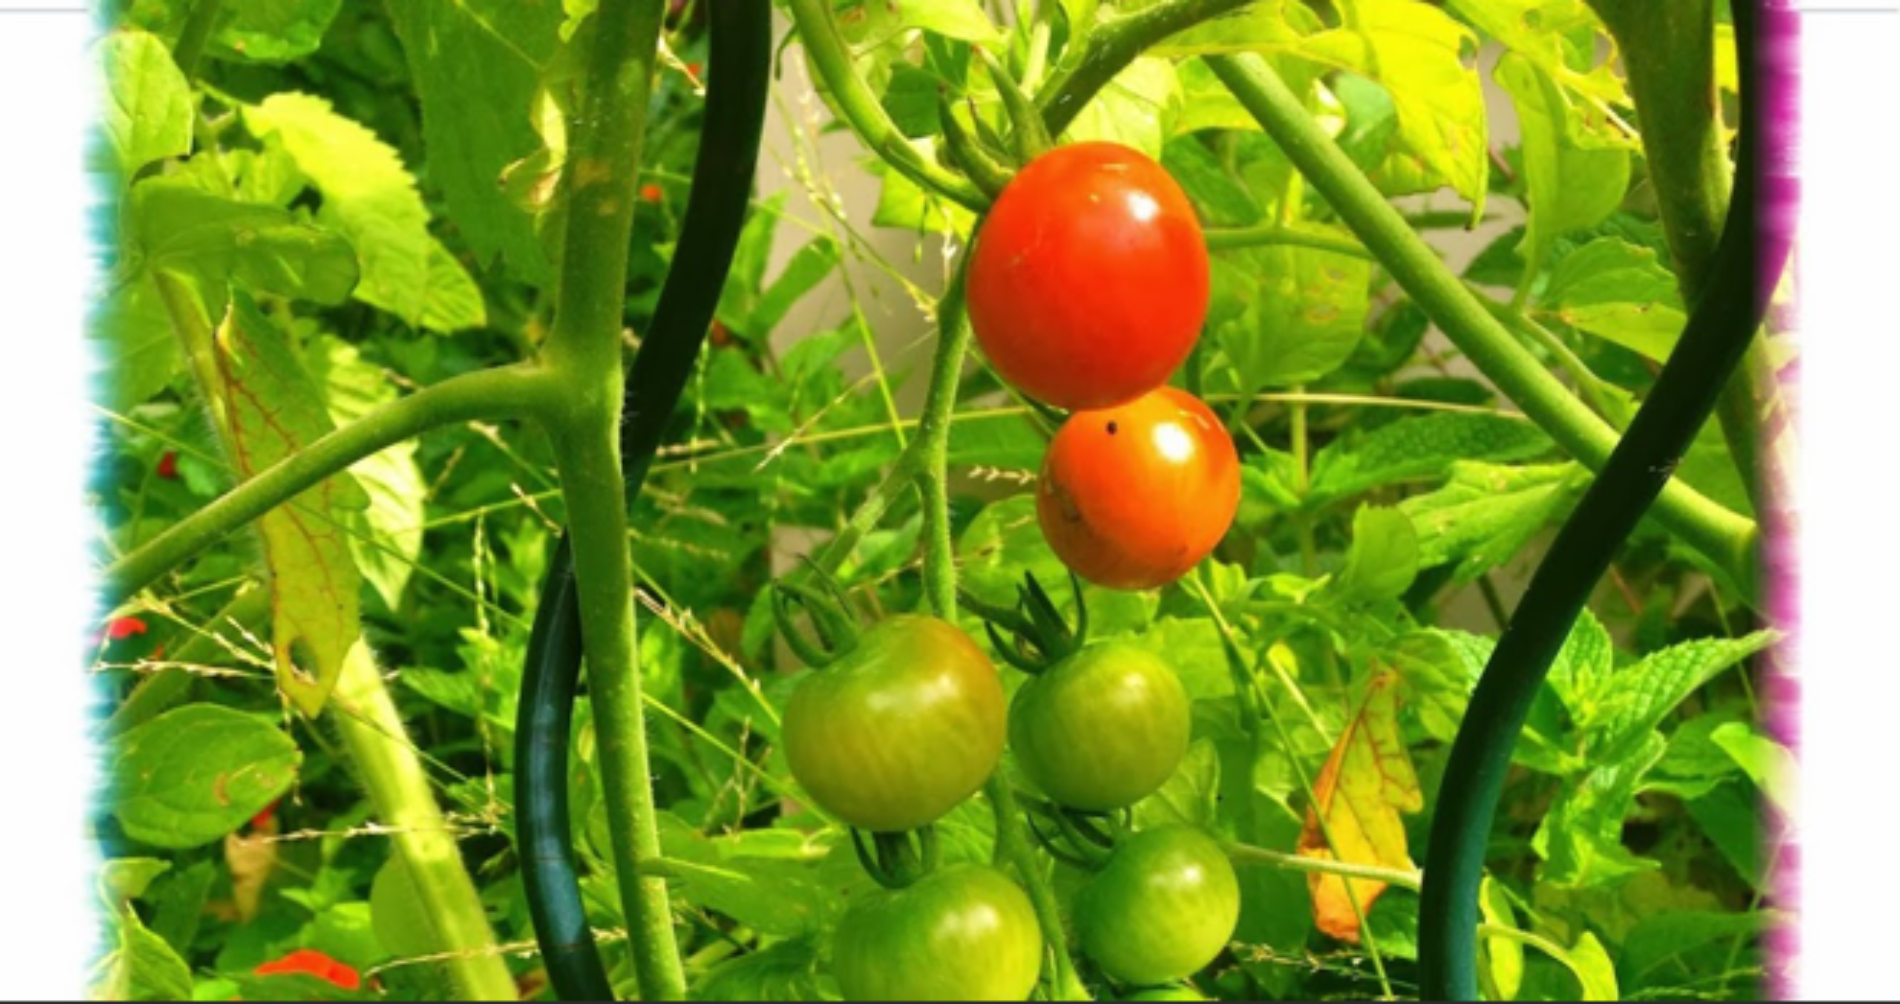 Say Hello to The Tomato Picking Robots